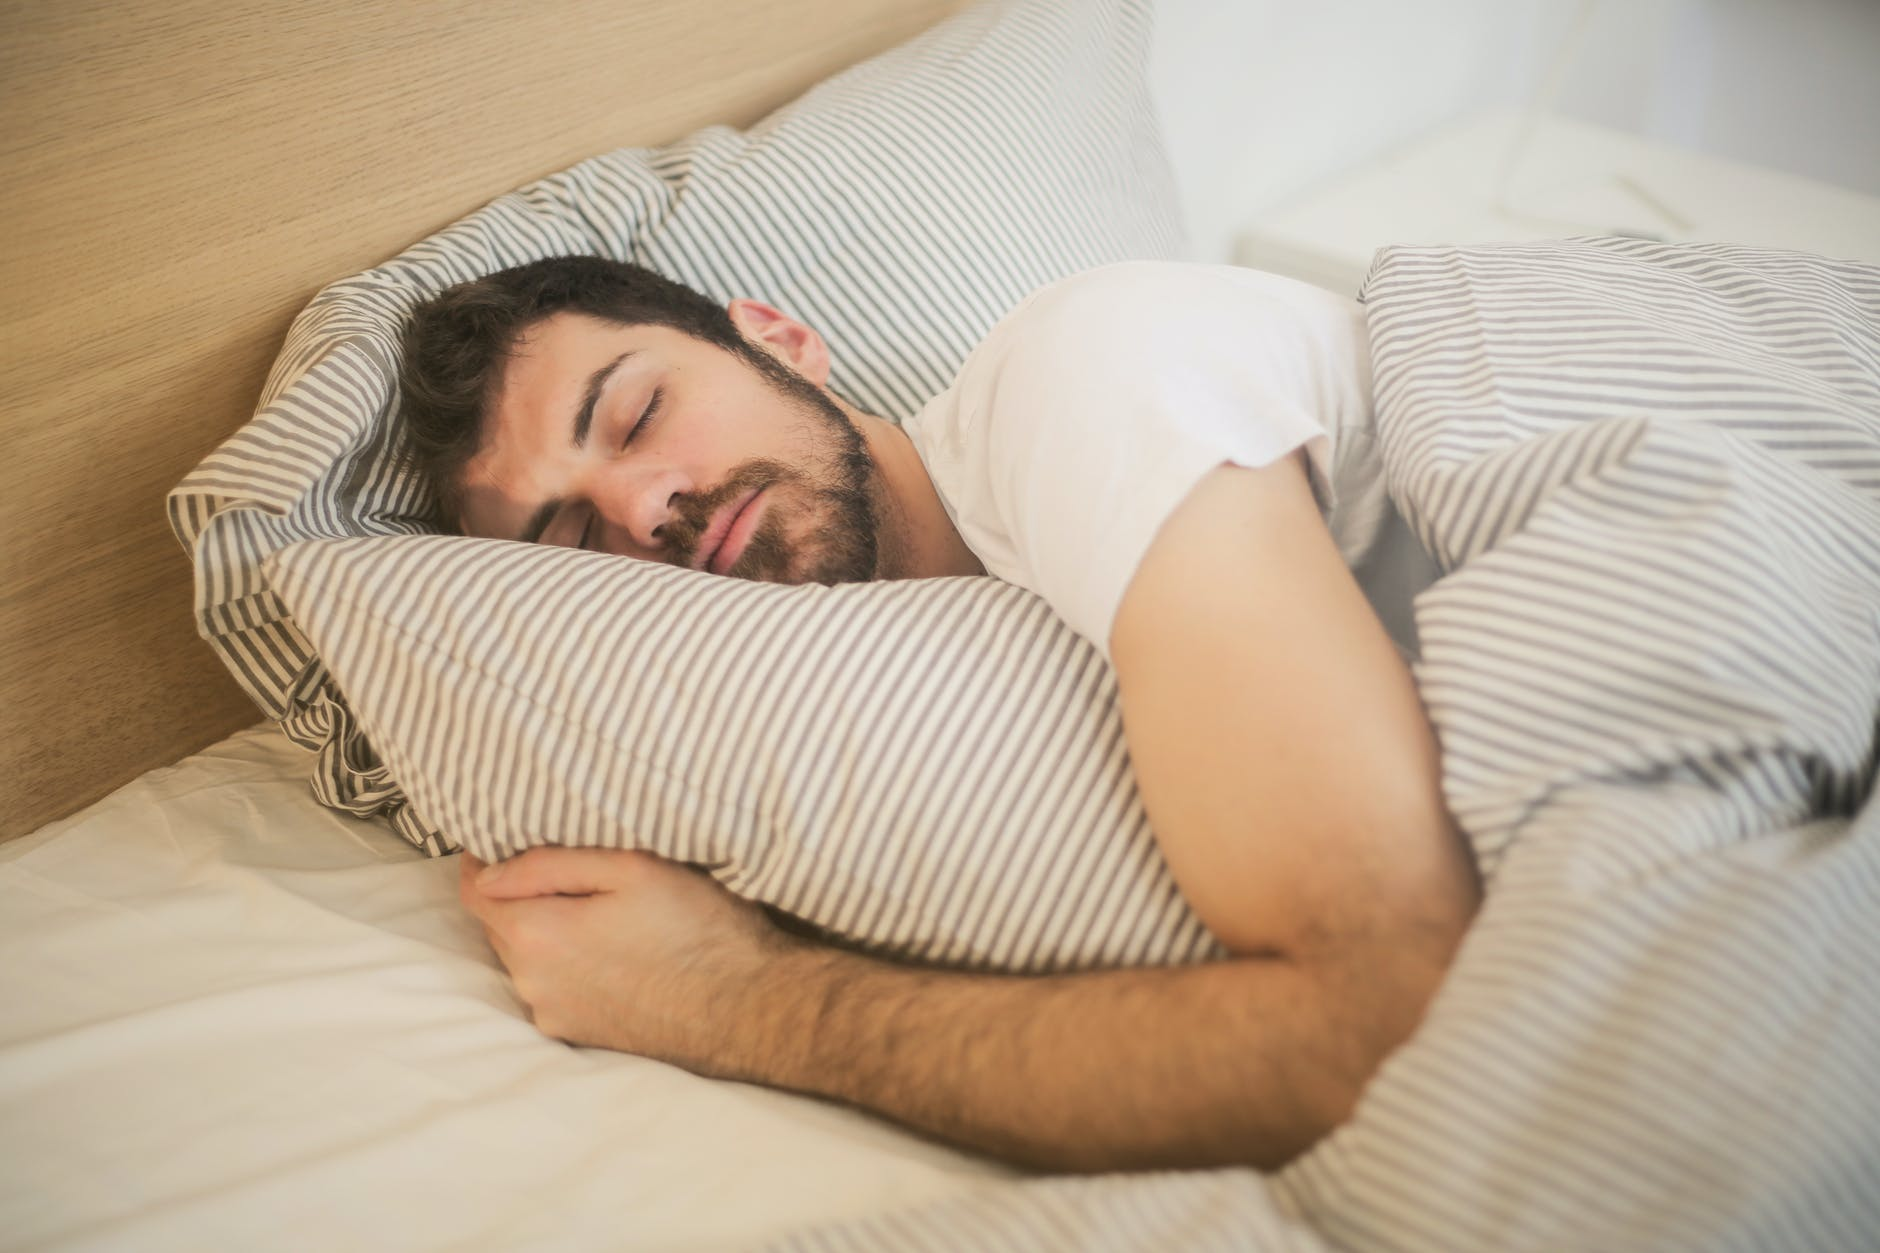 spiaci muž